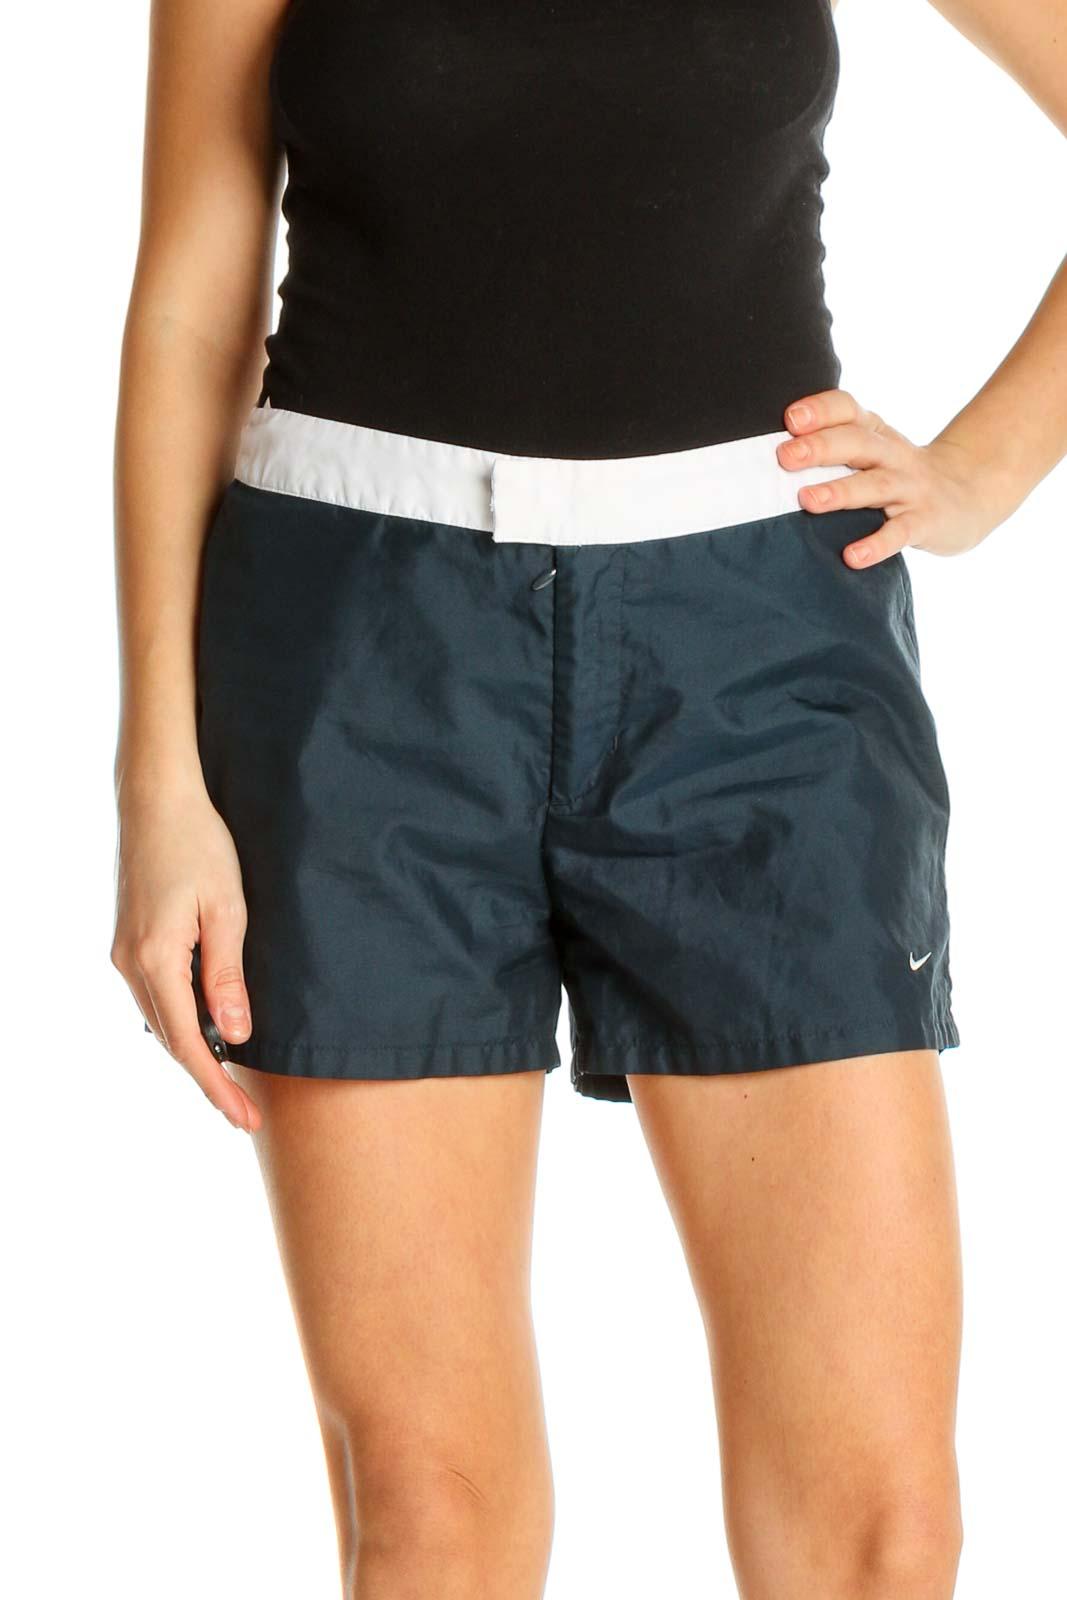 Blue Colorblock Activewear Shorts Front